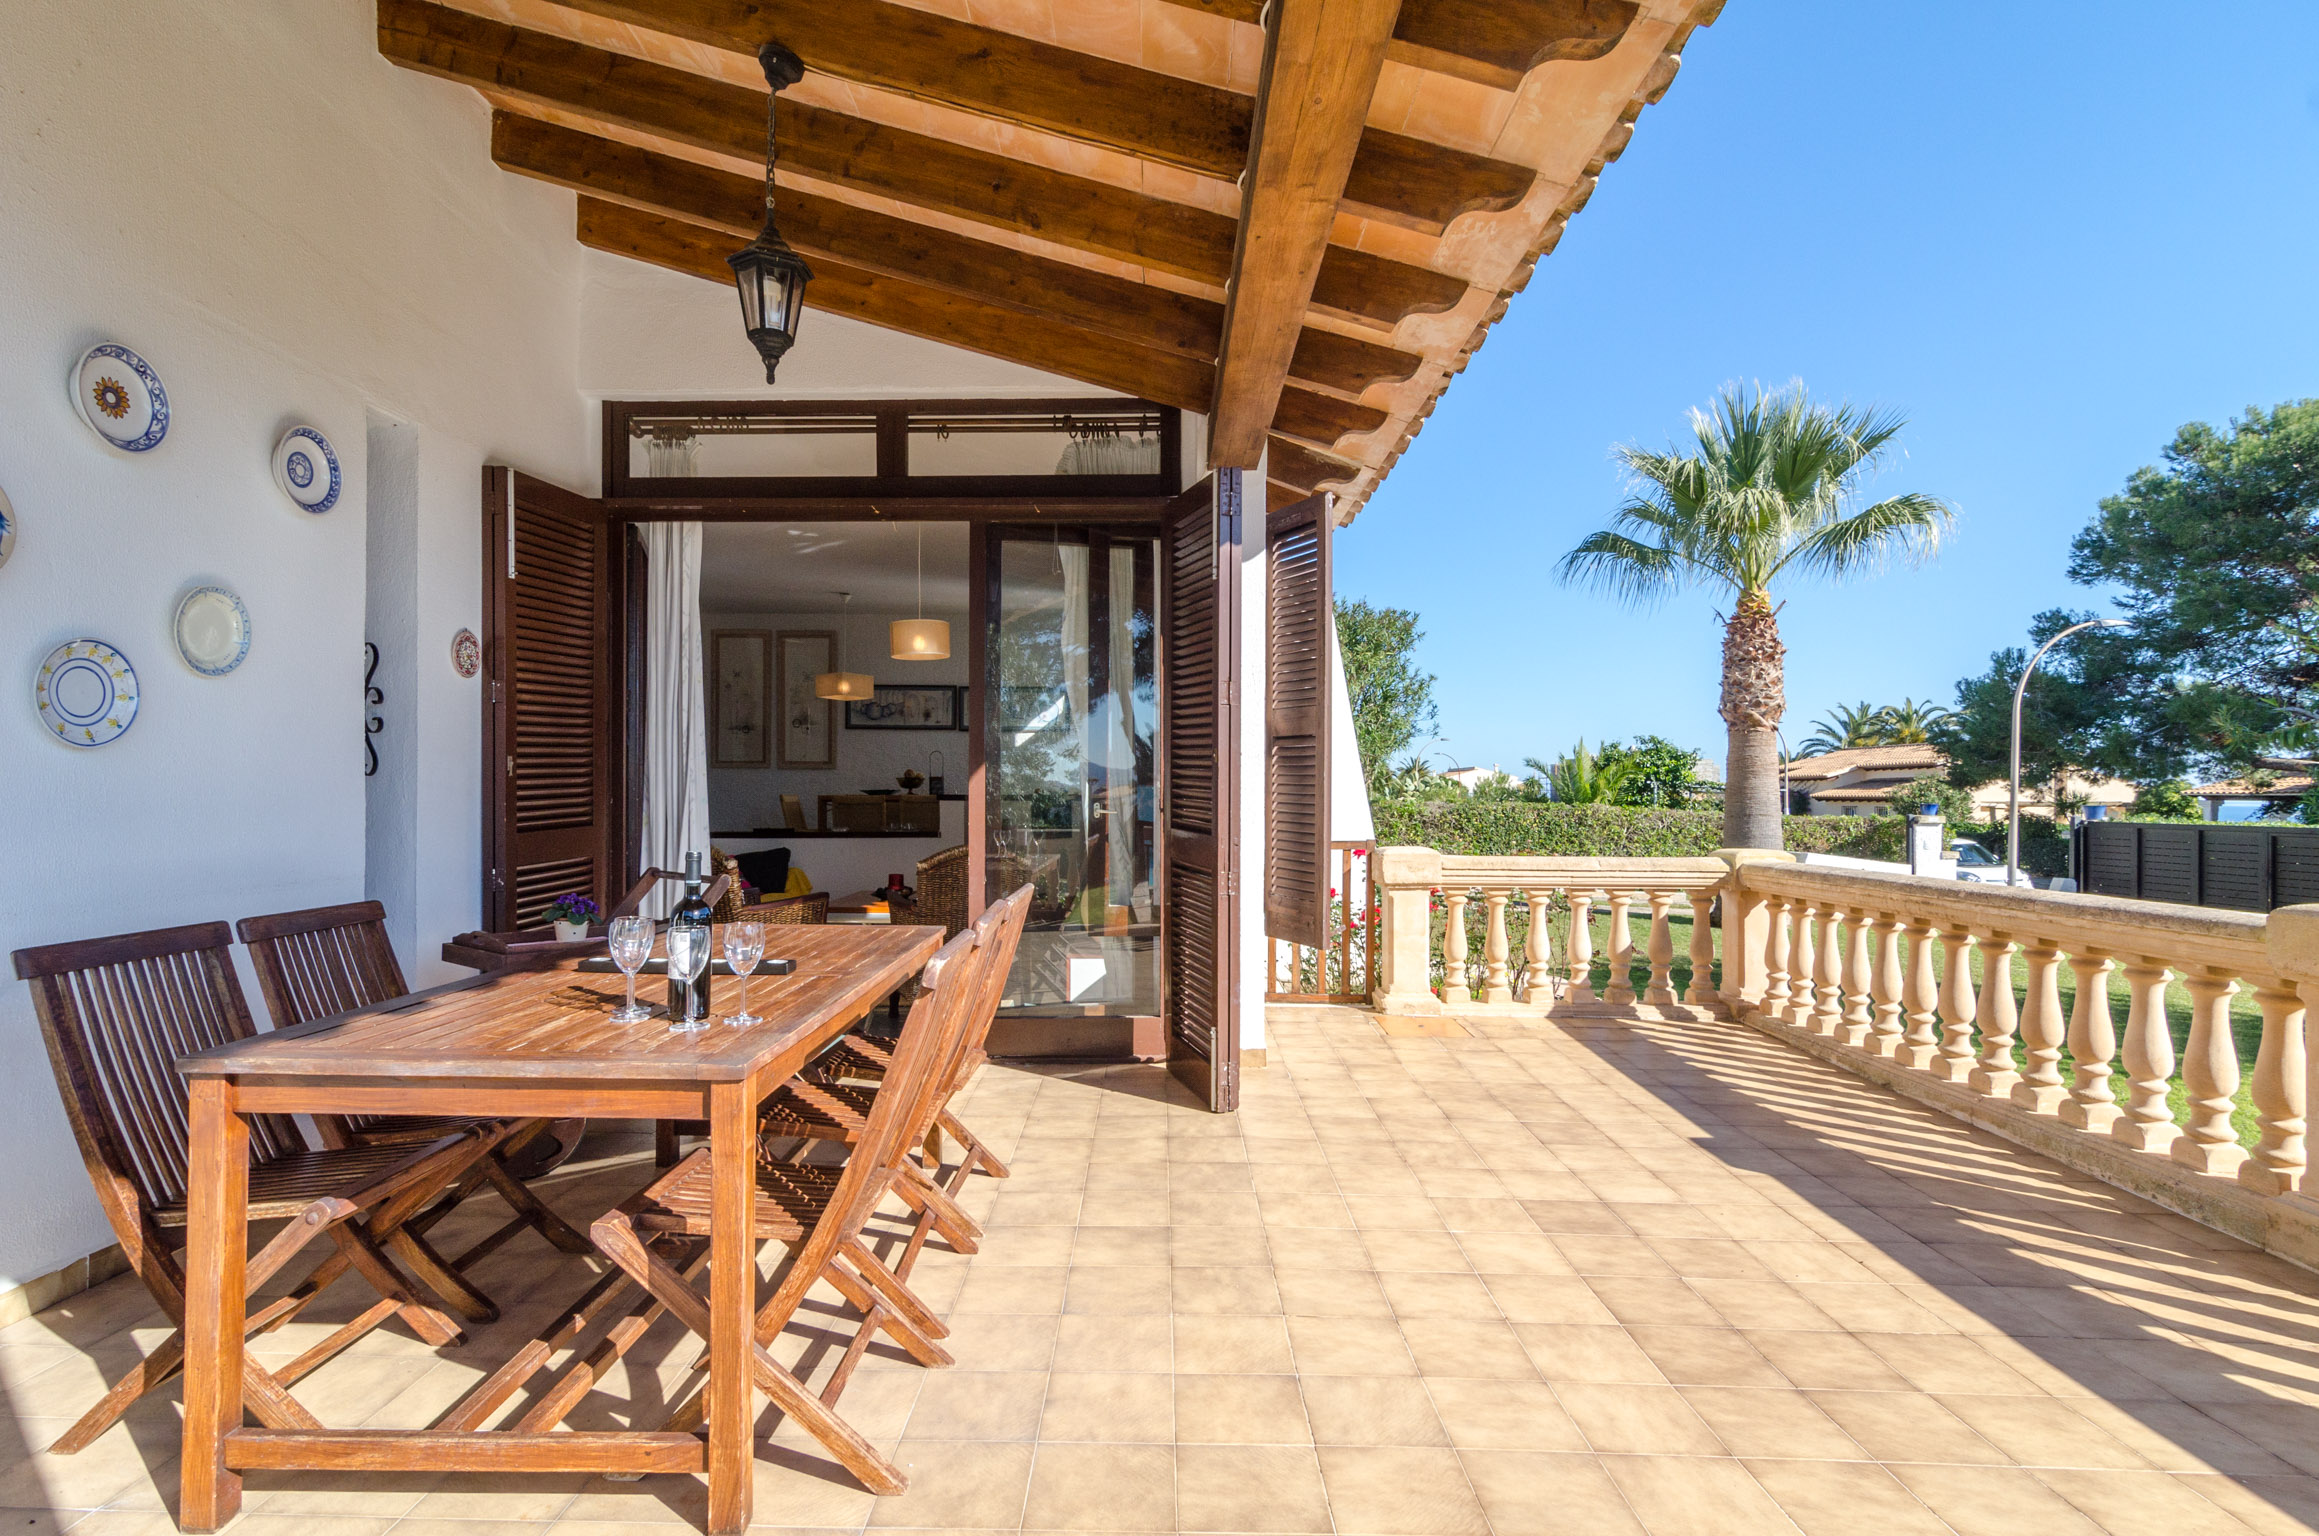 Ferienhaus CAN CALSINA (1871676), Cala Mandia, Mallorca, Balearische Inseln, Spanien, Bild 7